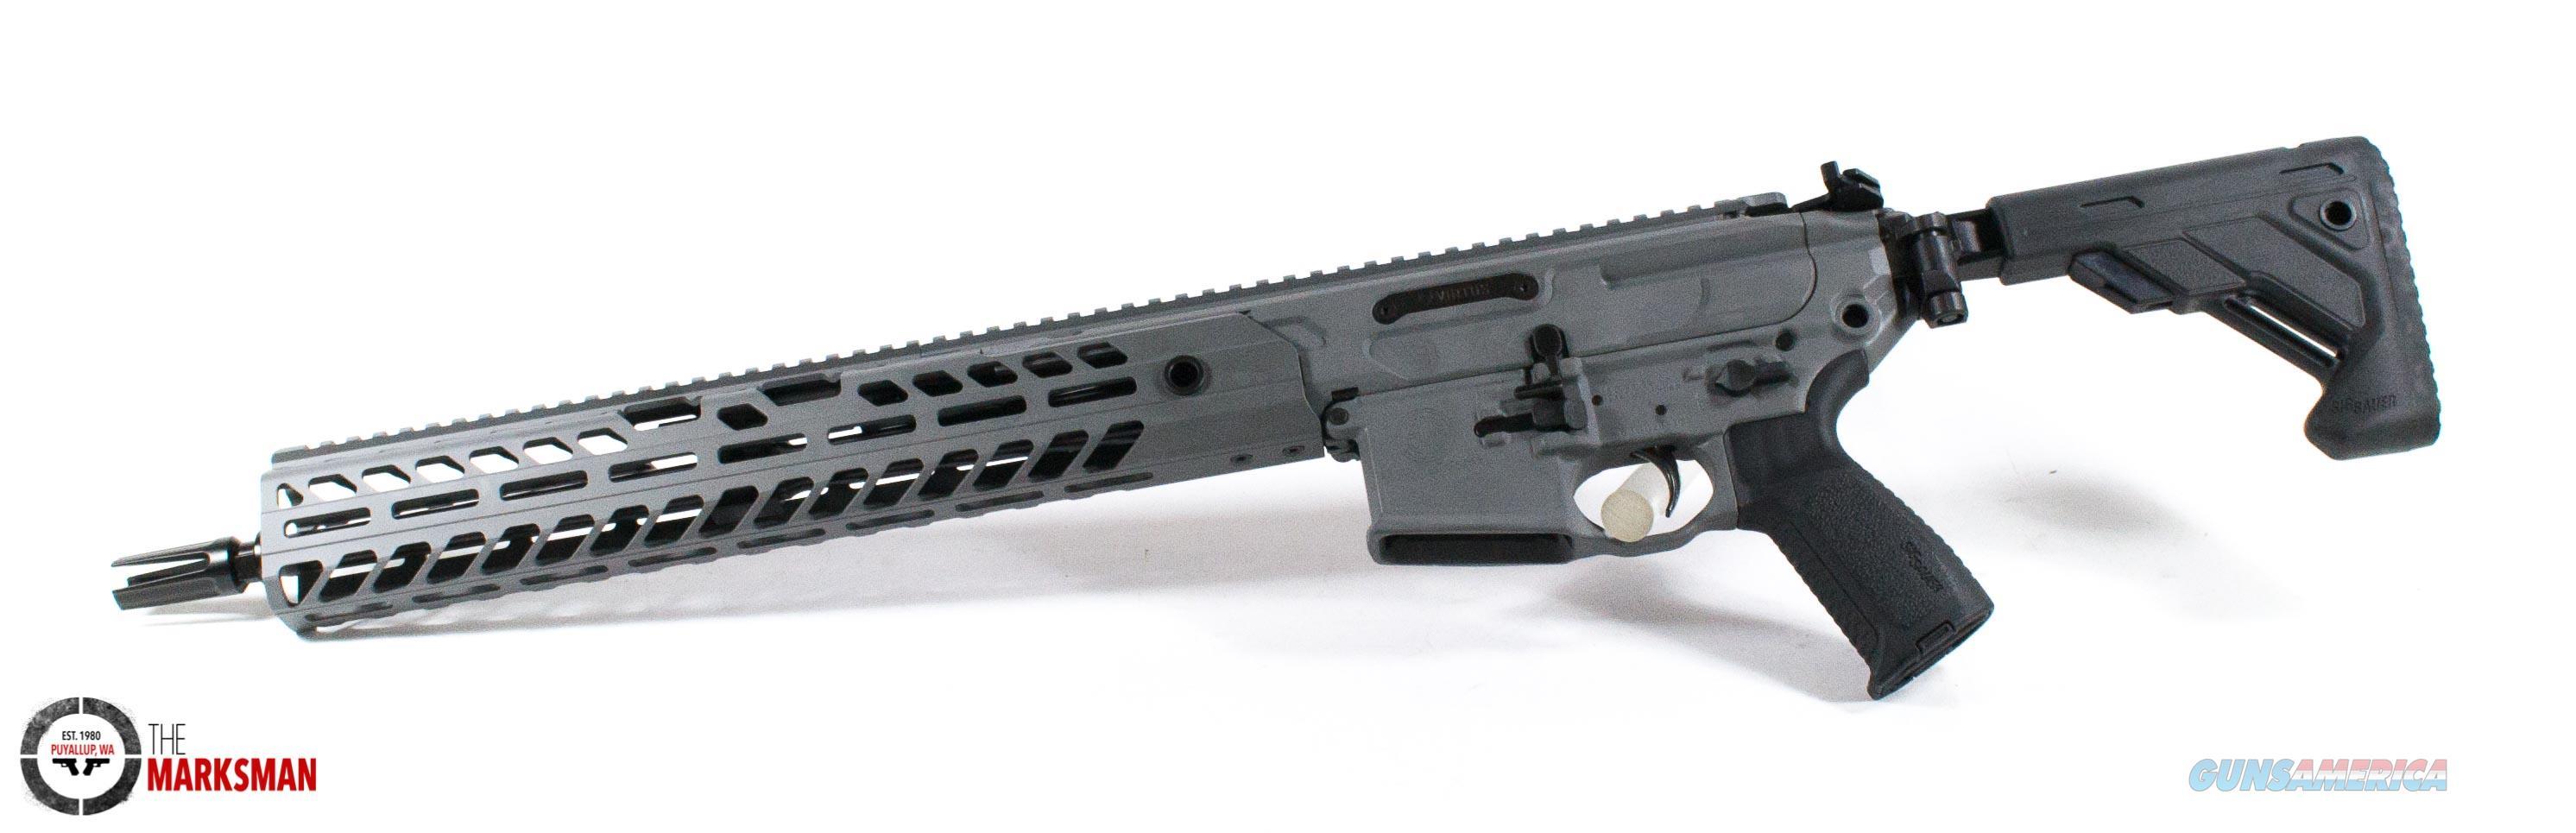 Sig Sauer MCX Virtus Patrol, 5.56mm NATO NEW Stealth Gray, Free Shipping  Guns > Rifles > Sig - Sauer/Sigarms Rifles